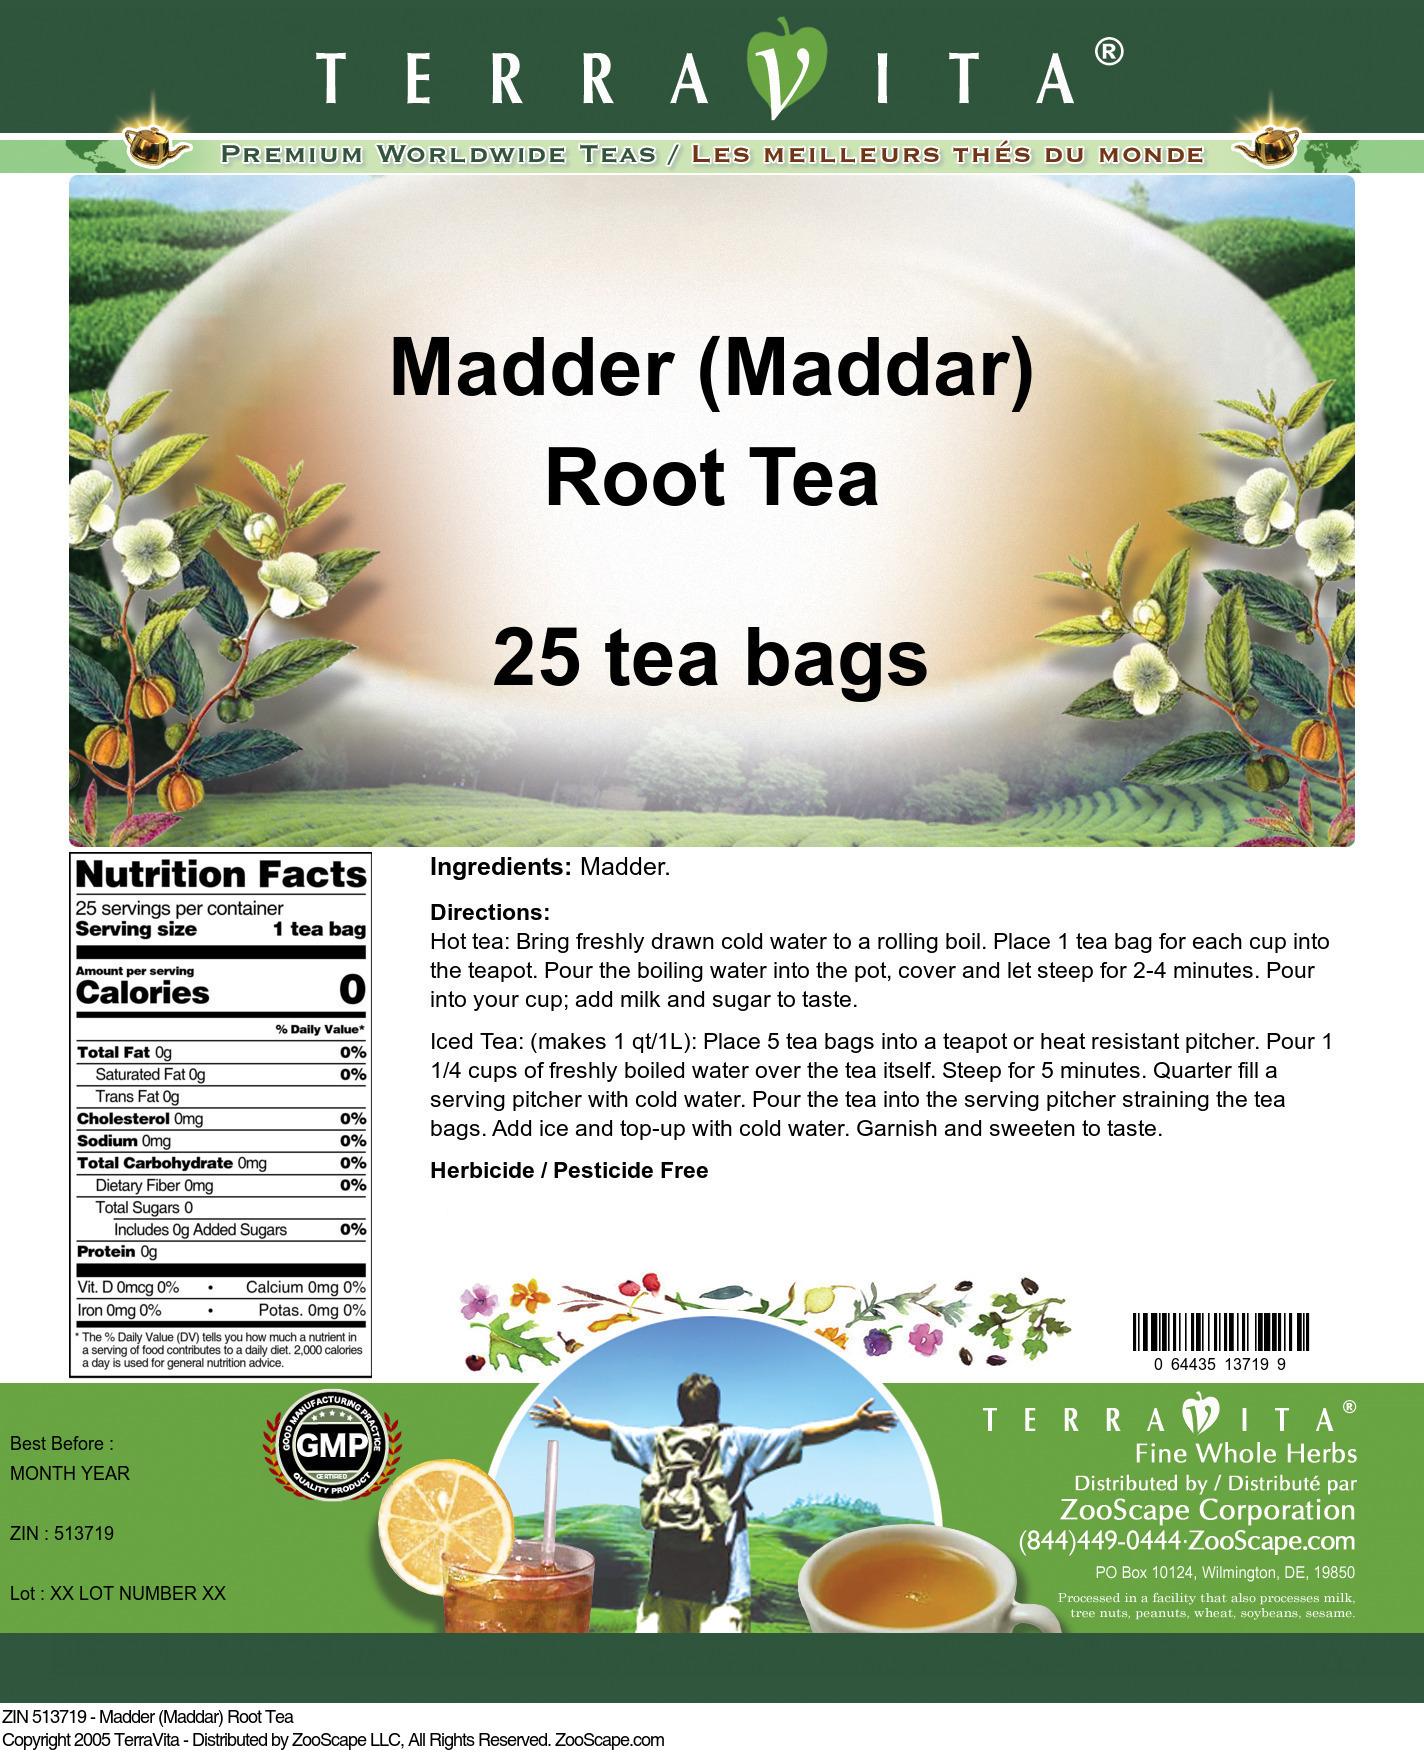 Madder (Maddar) Root Tea